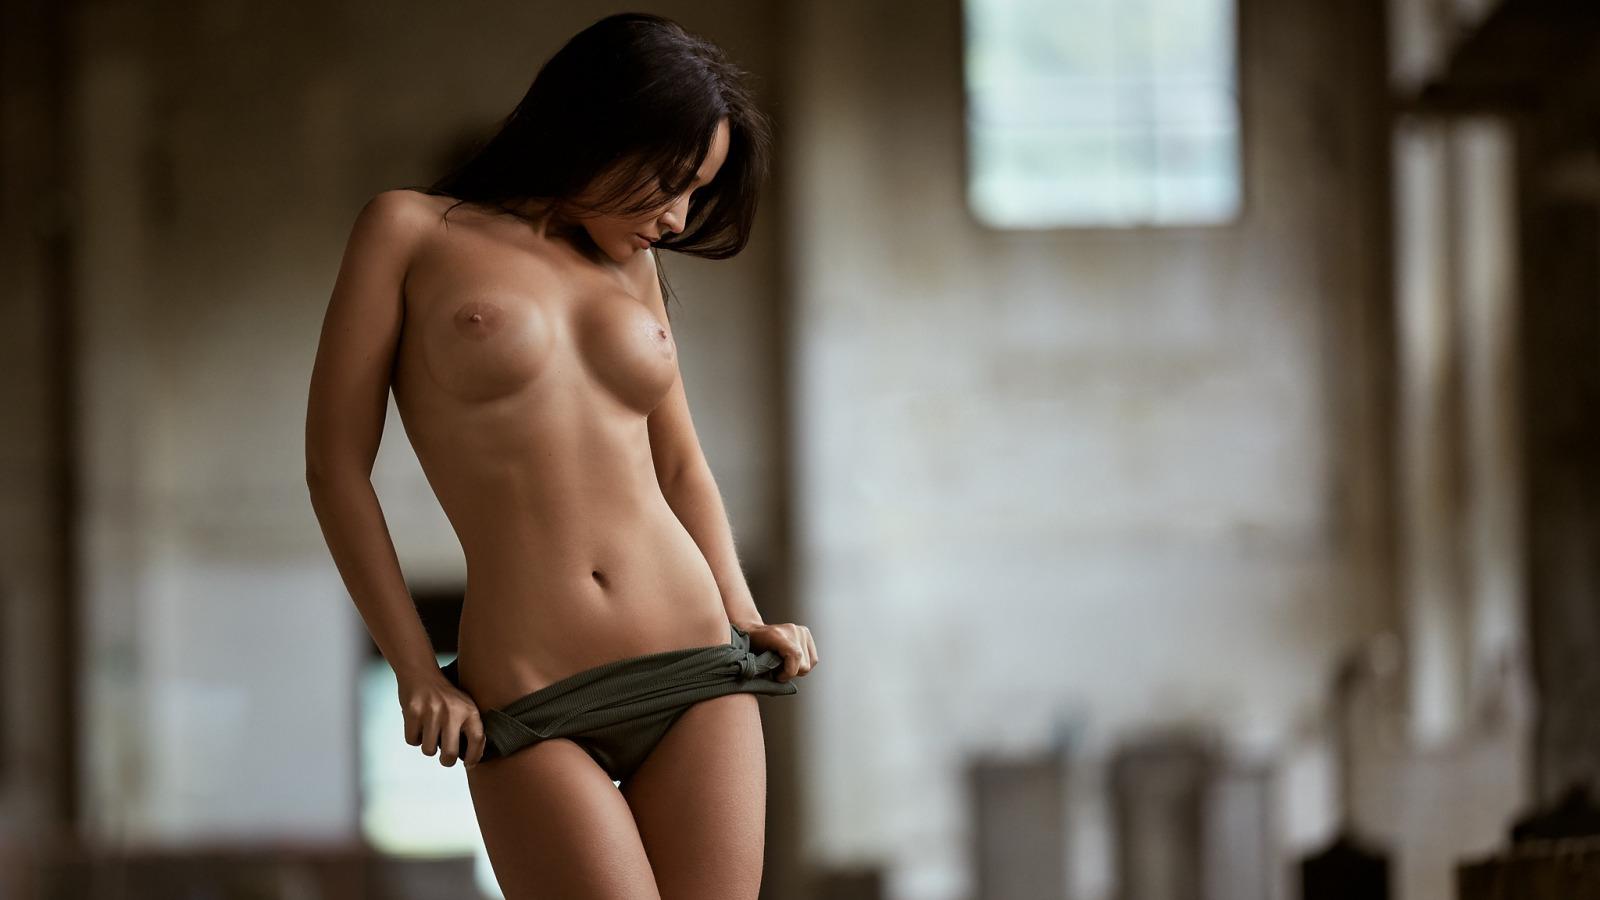 golie-foto-brazilskih-devushek